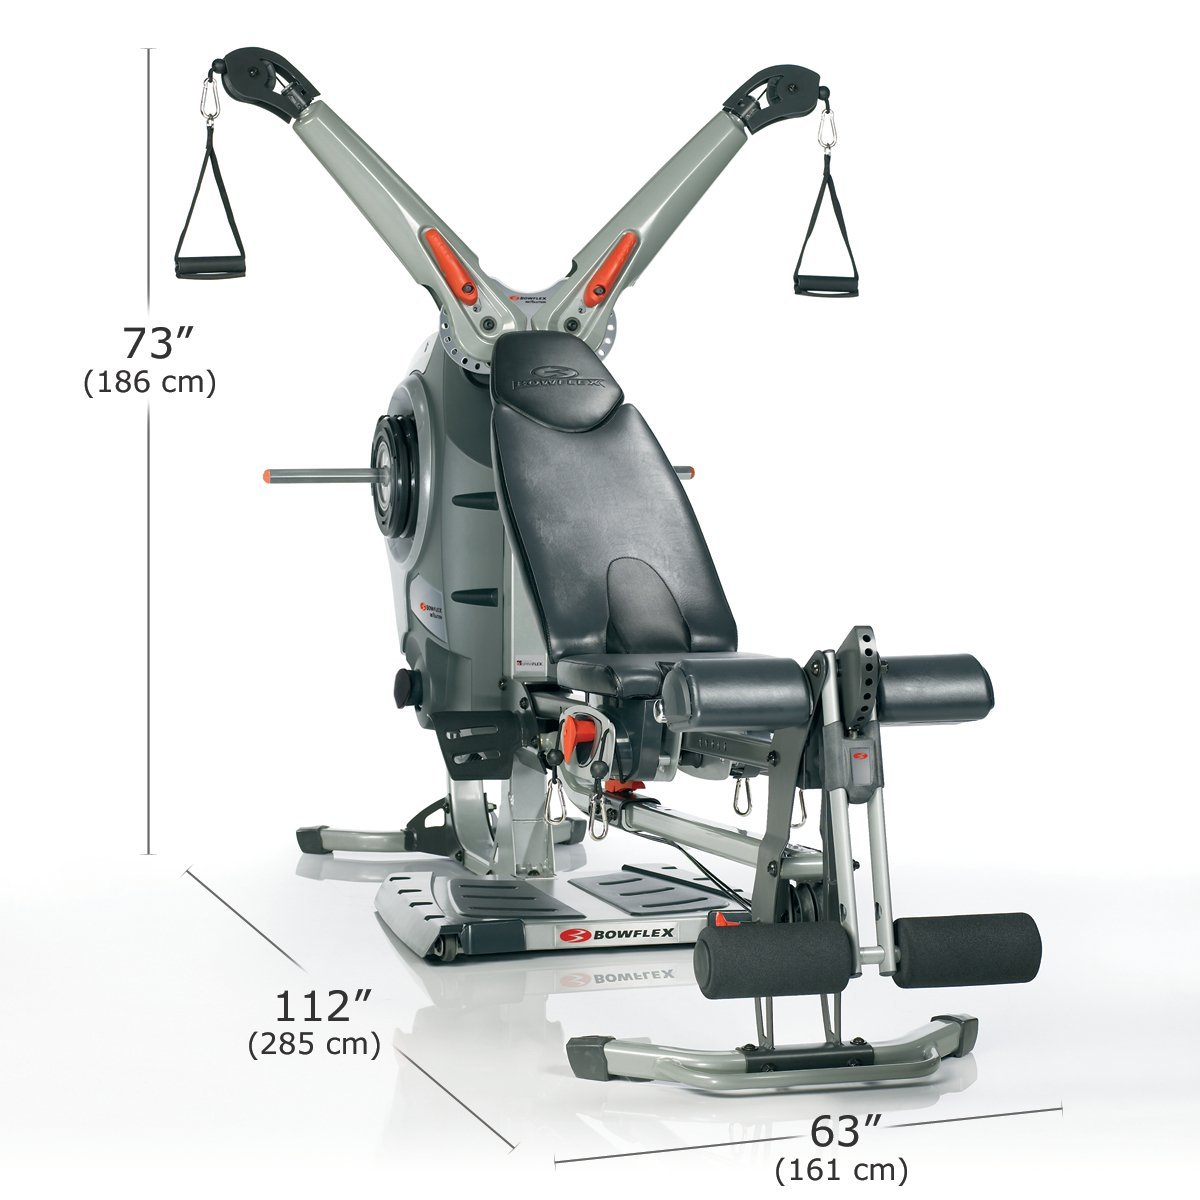 Bowflex revolution dimensions